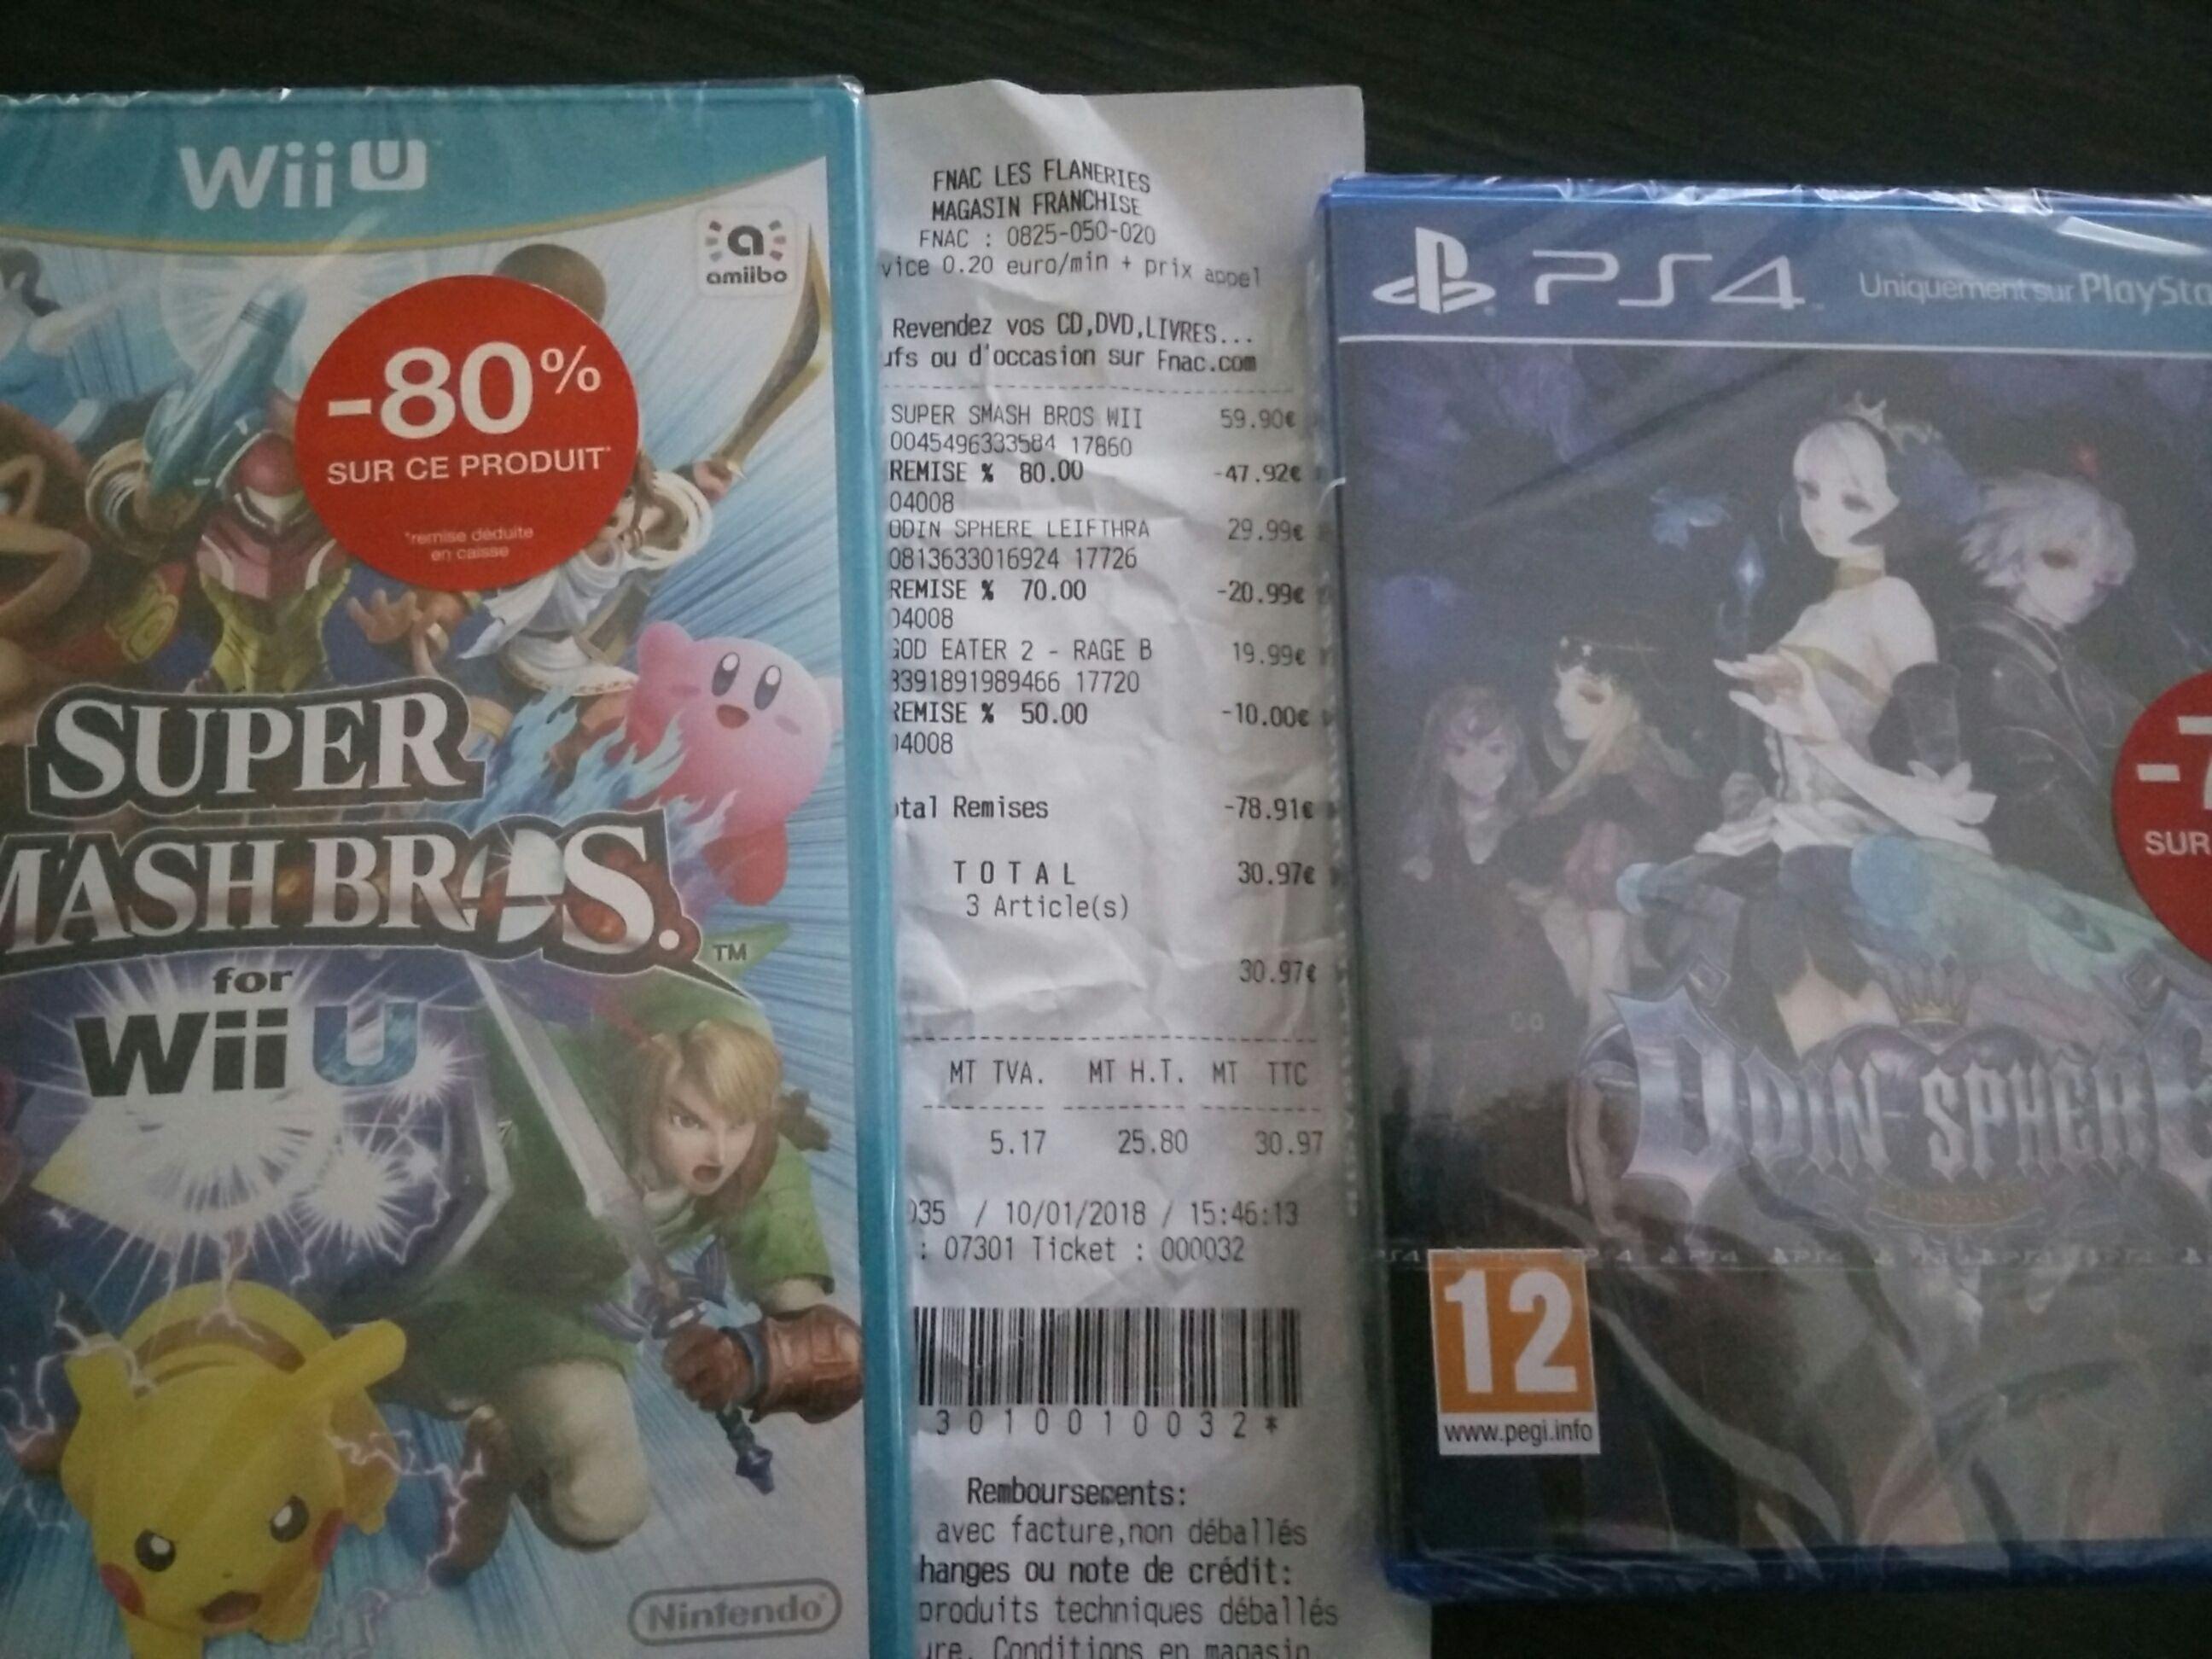 Super Smash Bros sur Wii u - La roche sur yon (85)